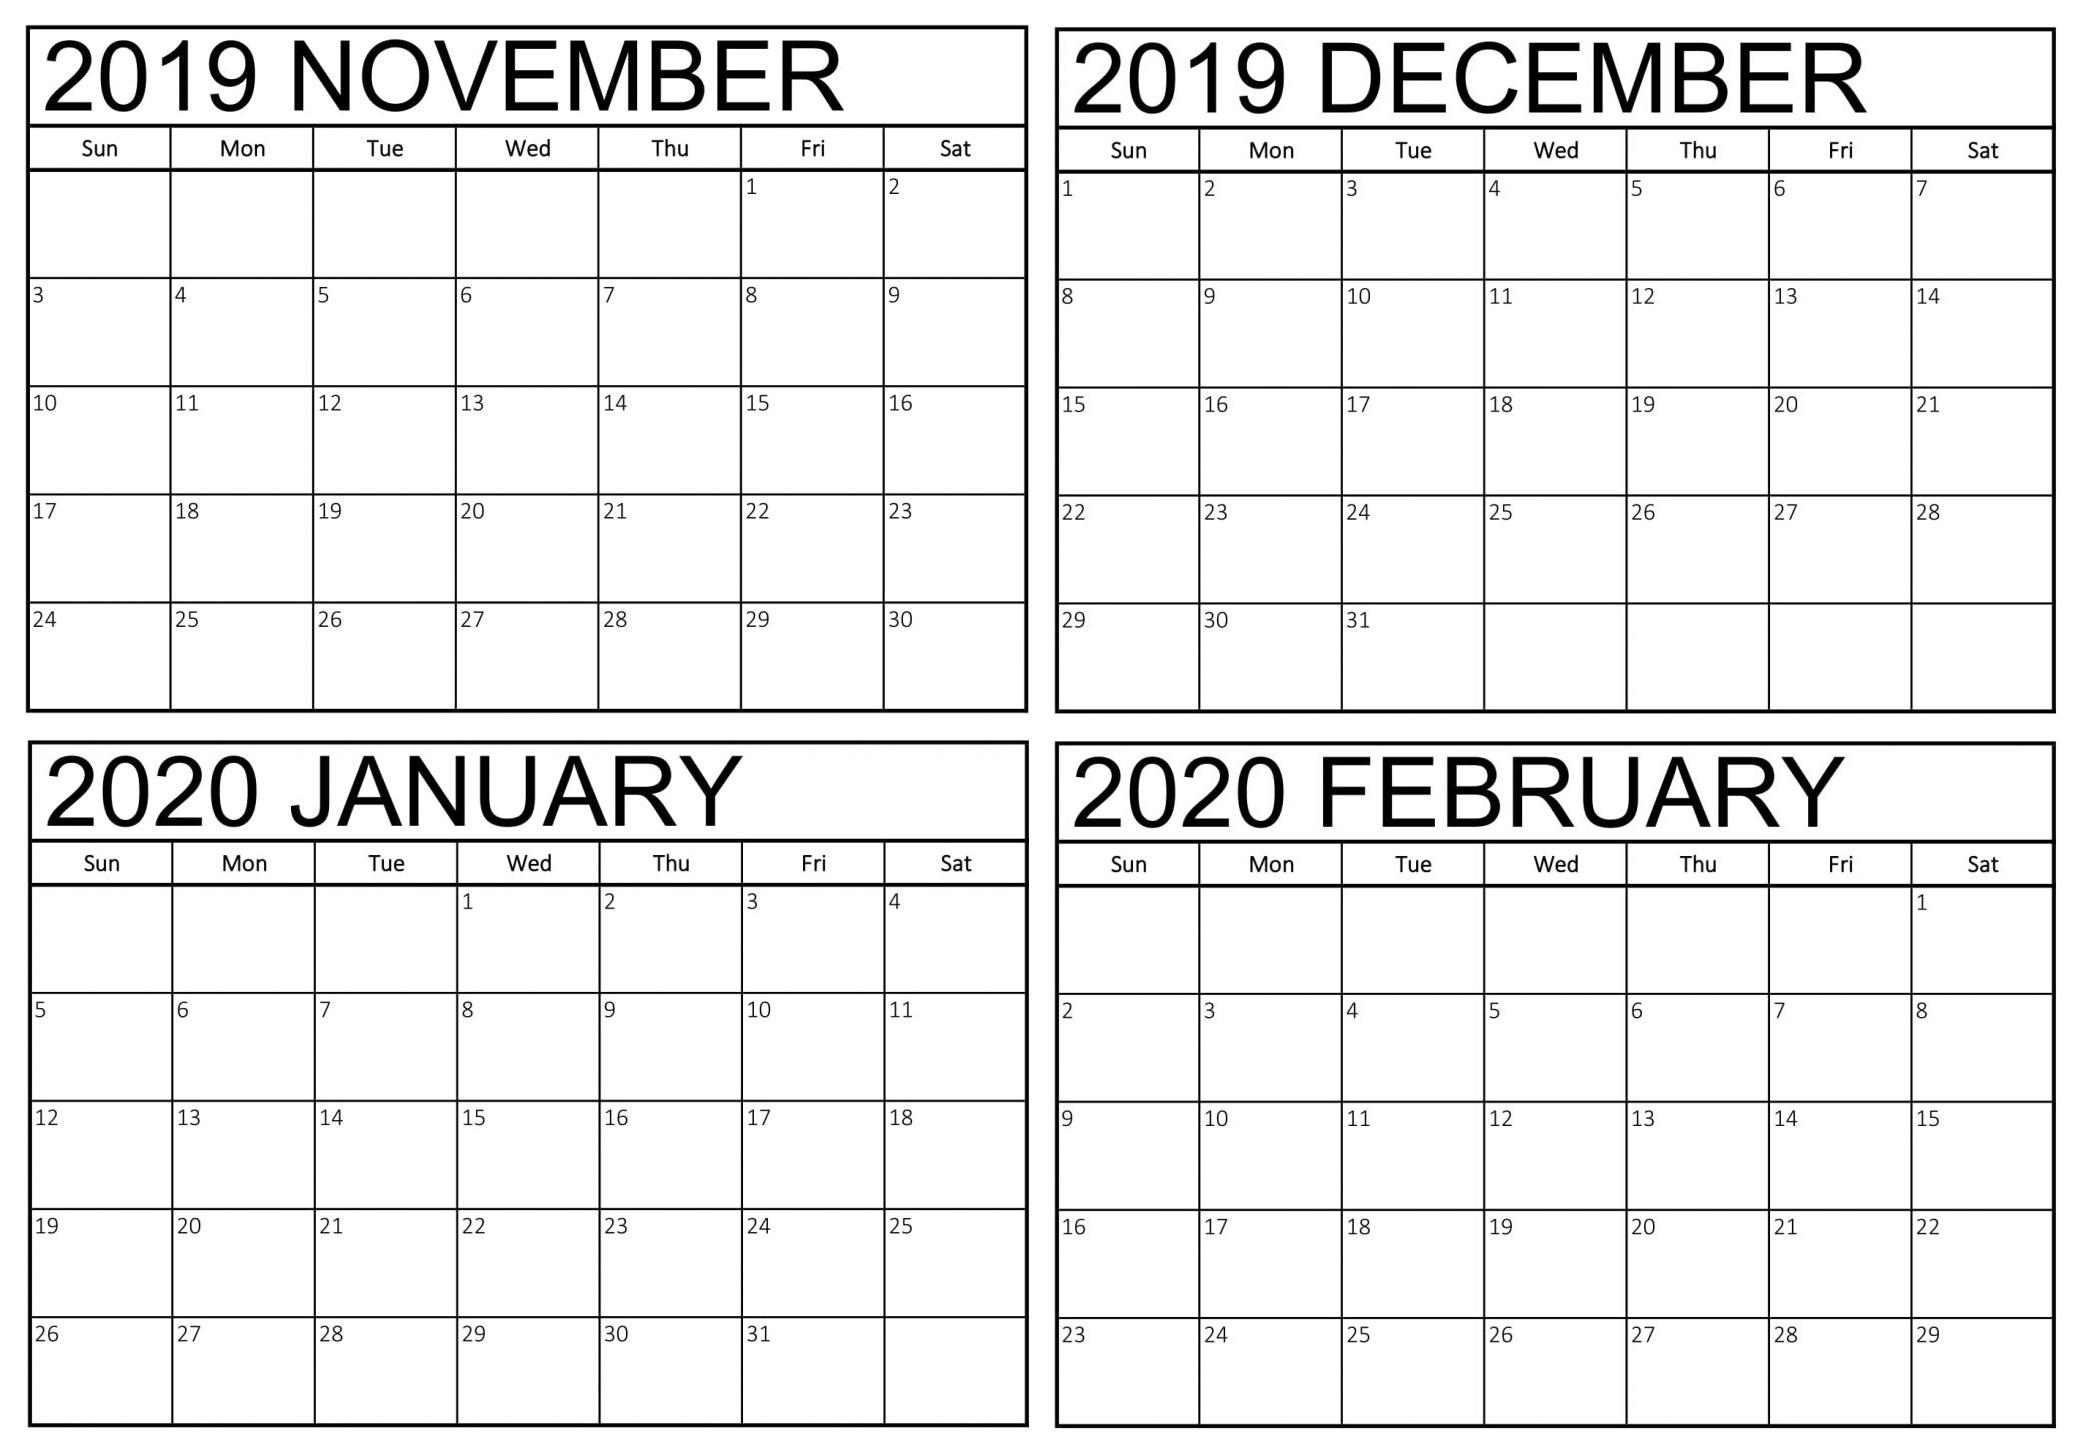 Blank November 2019 To February 2020 Calendar - 2019-4 Month Calendar Template 2020